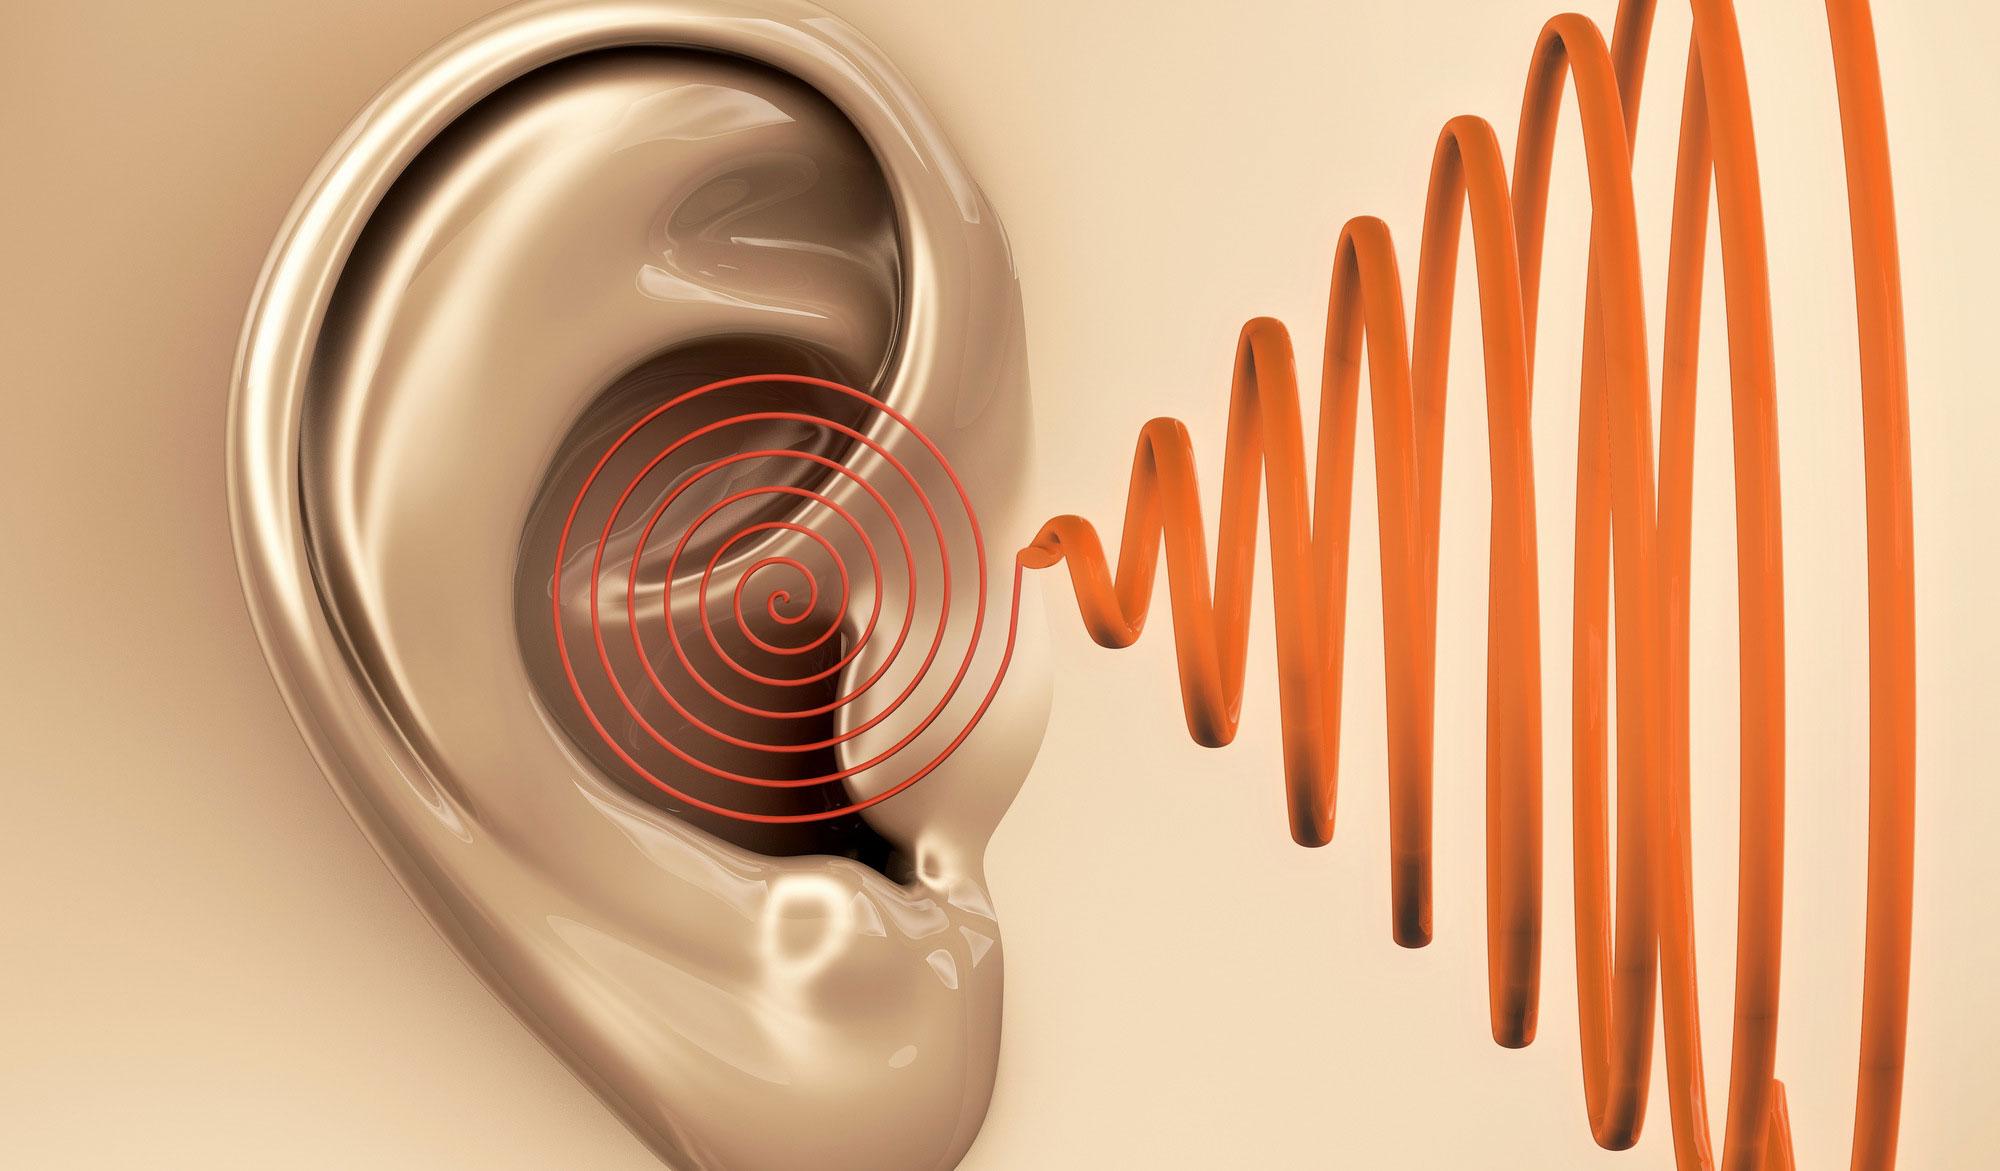 transmissao-funcionamento-som